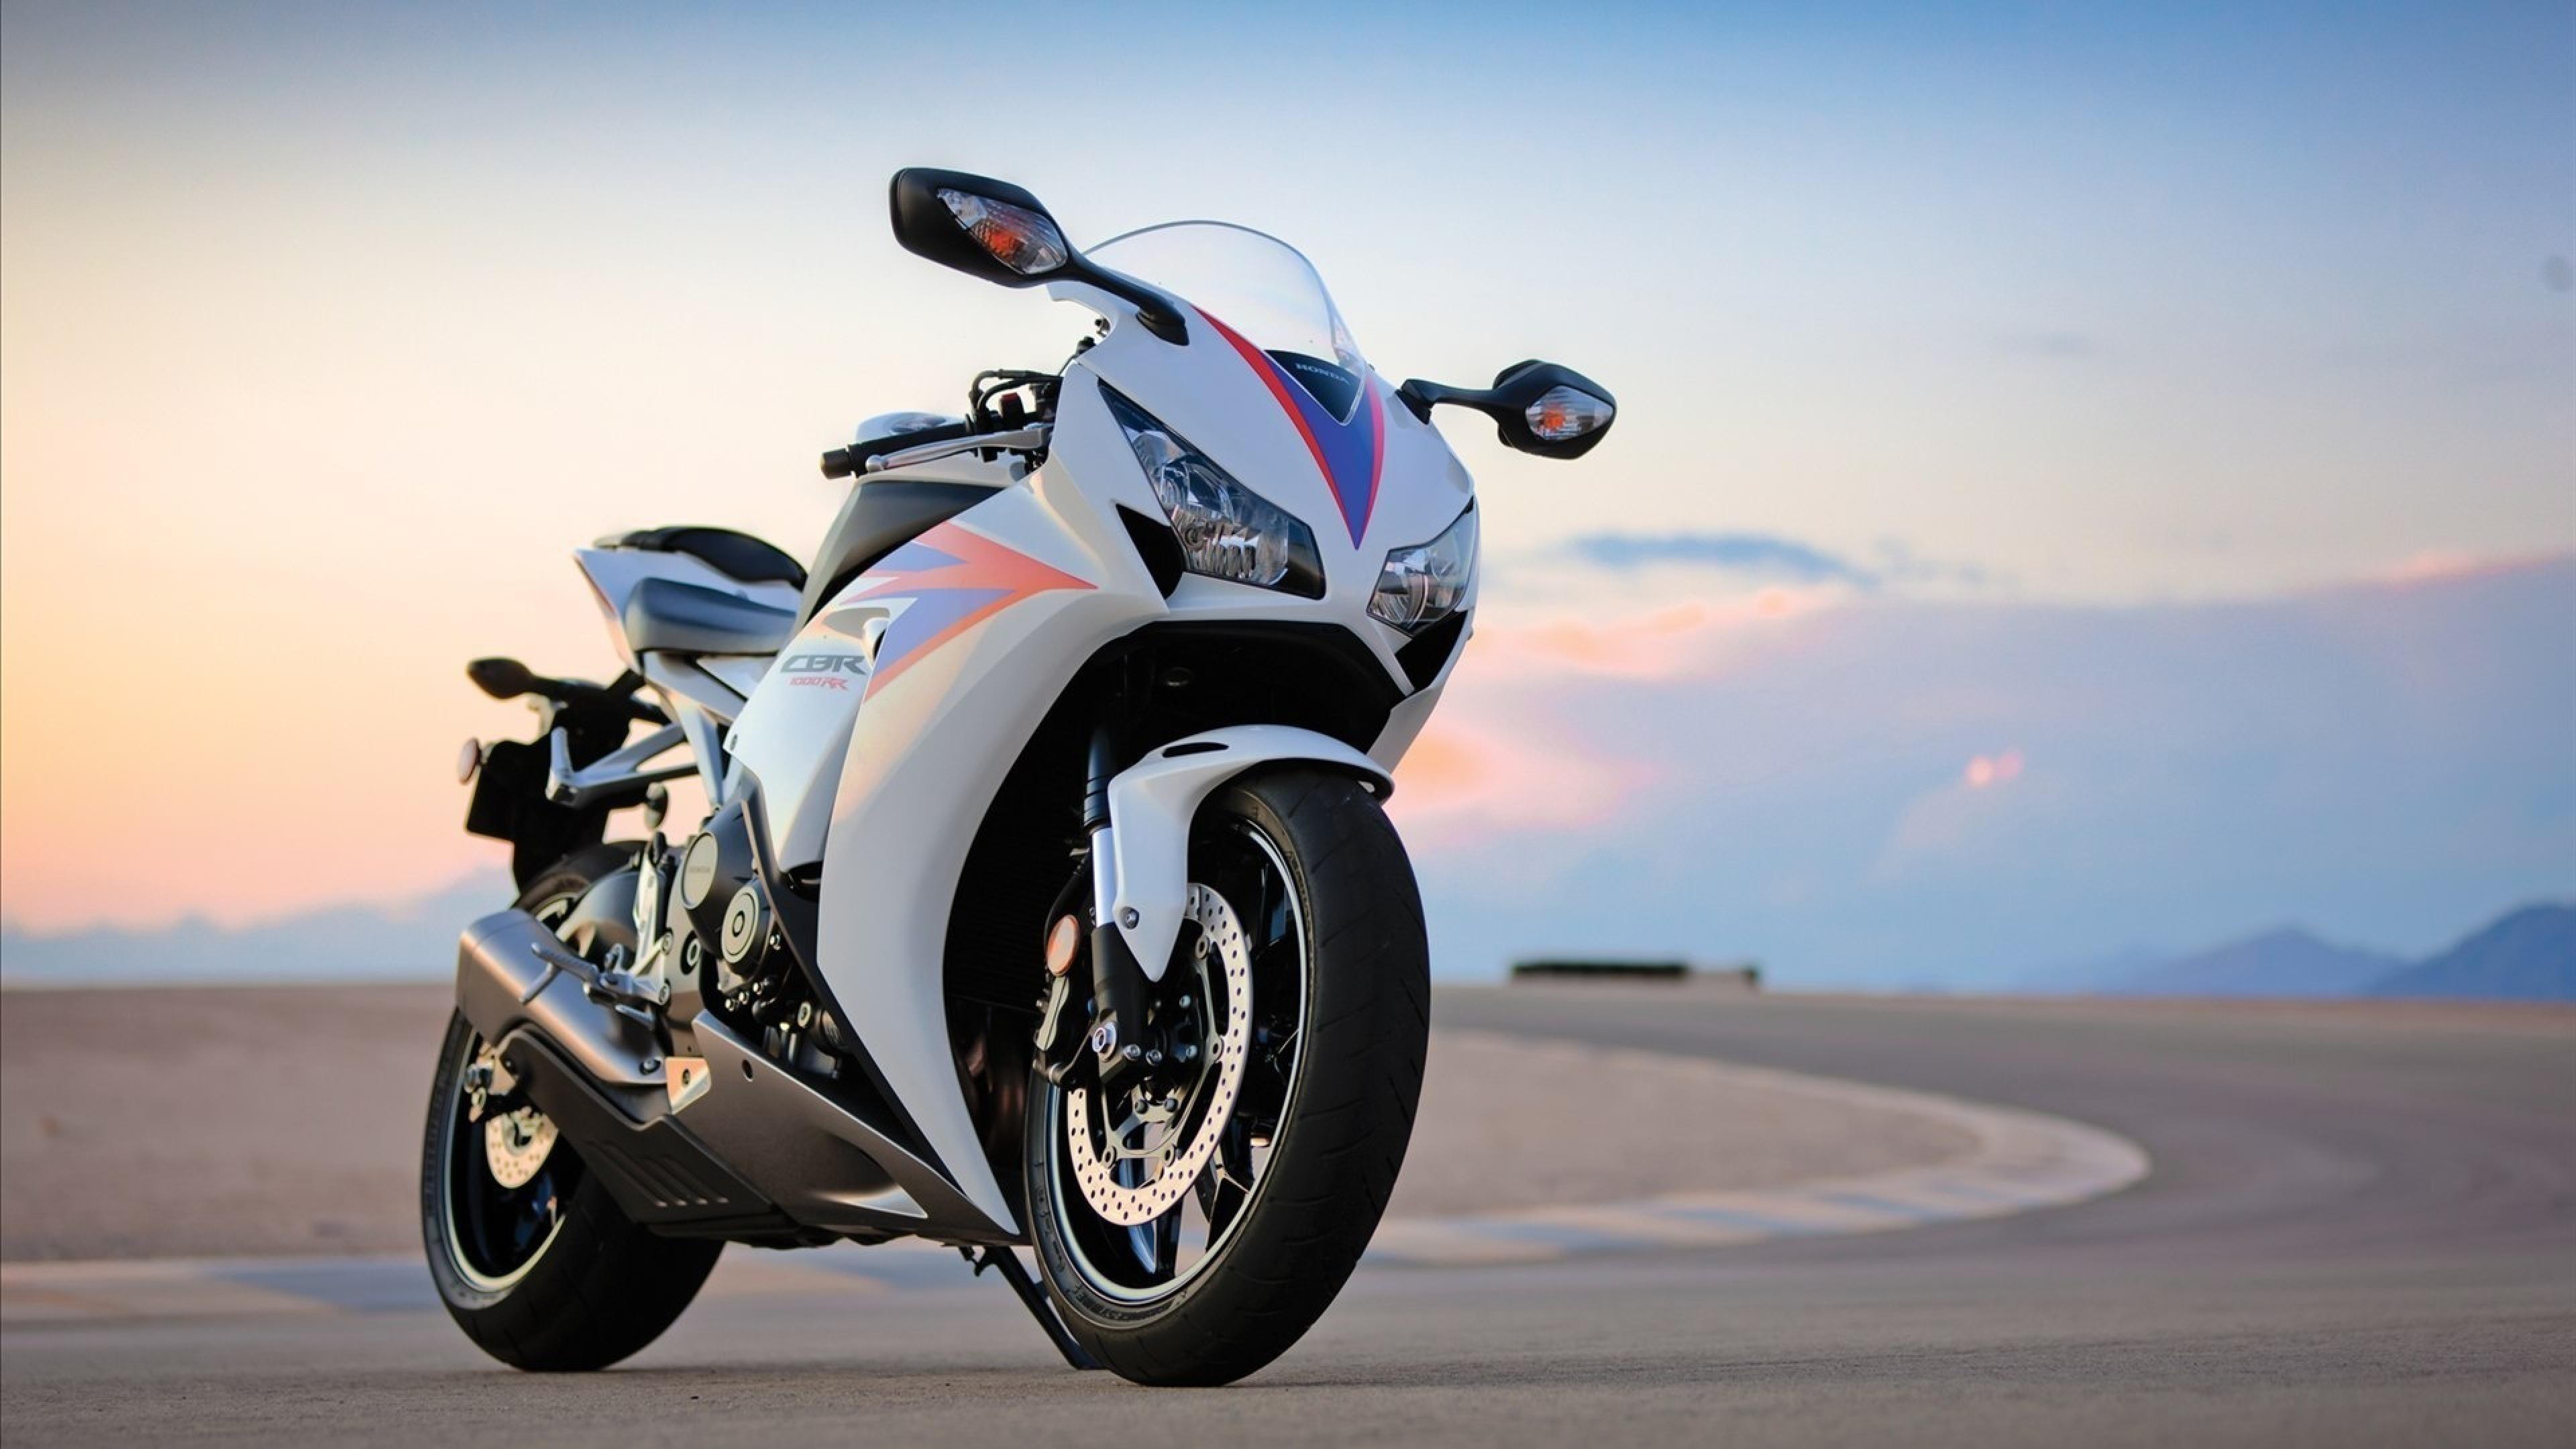 Honda Cbr 1000rr, HD Bikes, 4k Wallpapers, Images